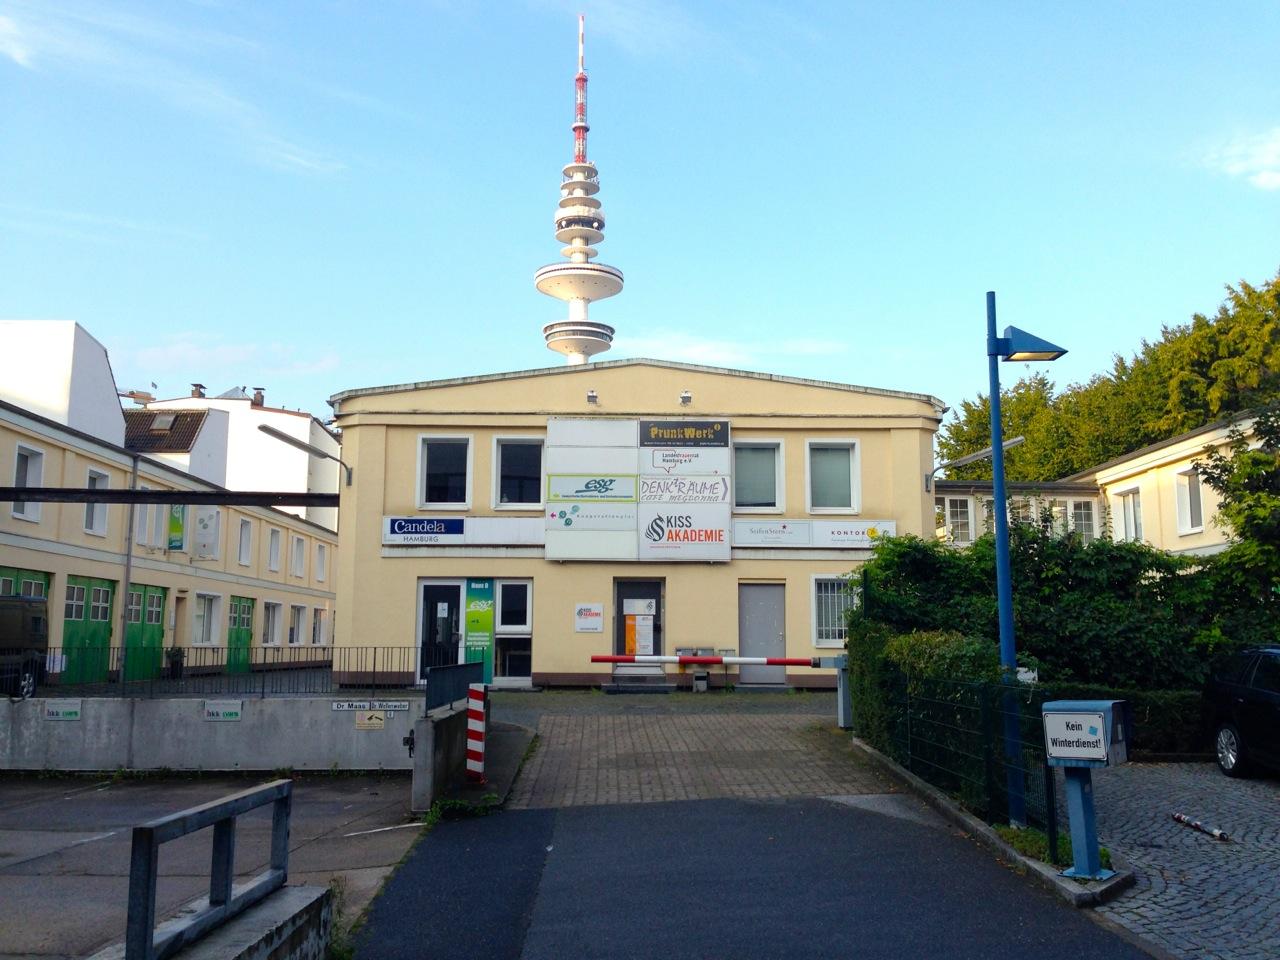 Sauerberg-Flohmarkt (Schwerpunkt Medien)